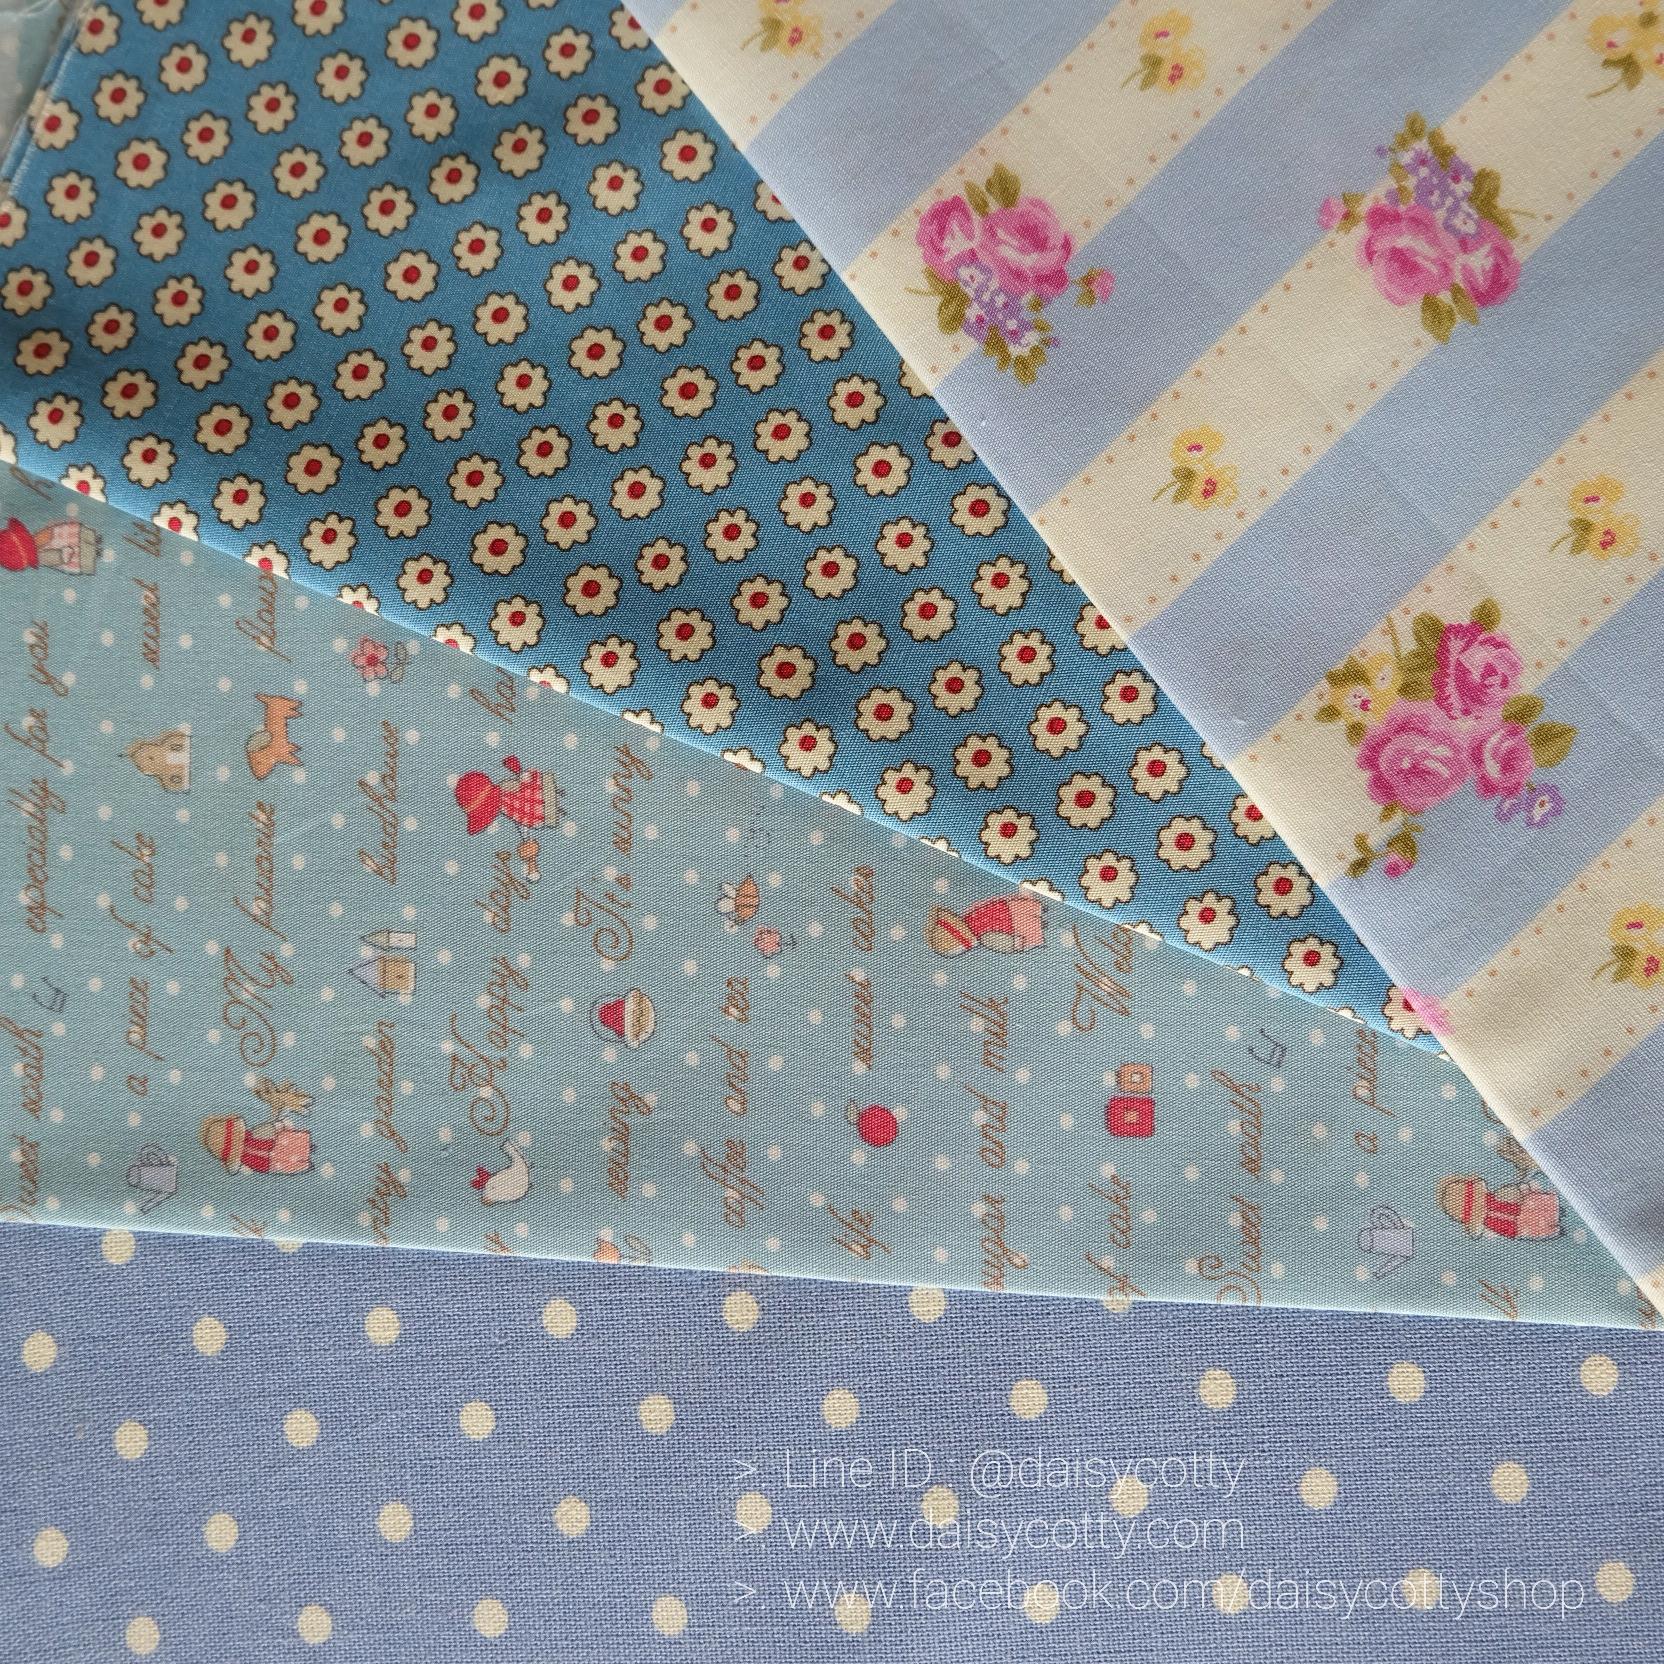 Set 4 ชิ้น : ผ้าคอตตอน100% โทนสีฟ้า 3 ลายและผ้าแคนวาส ลายจุด แต่ละชิ้นขนาด1/8 ม.(50x27.5ซม.)